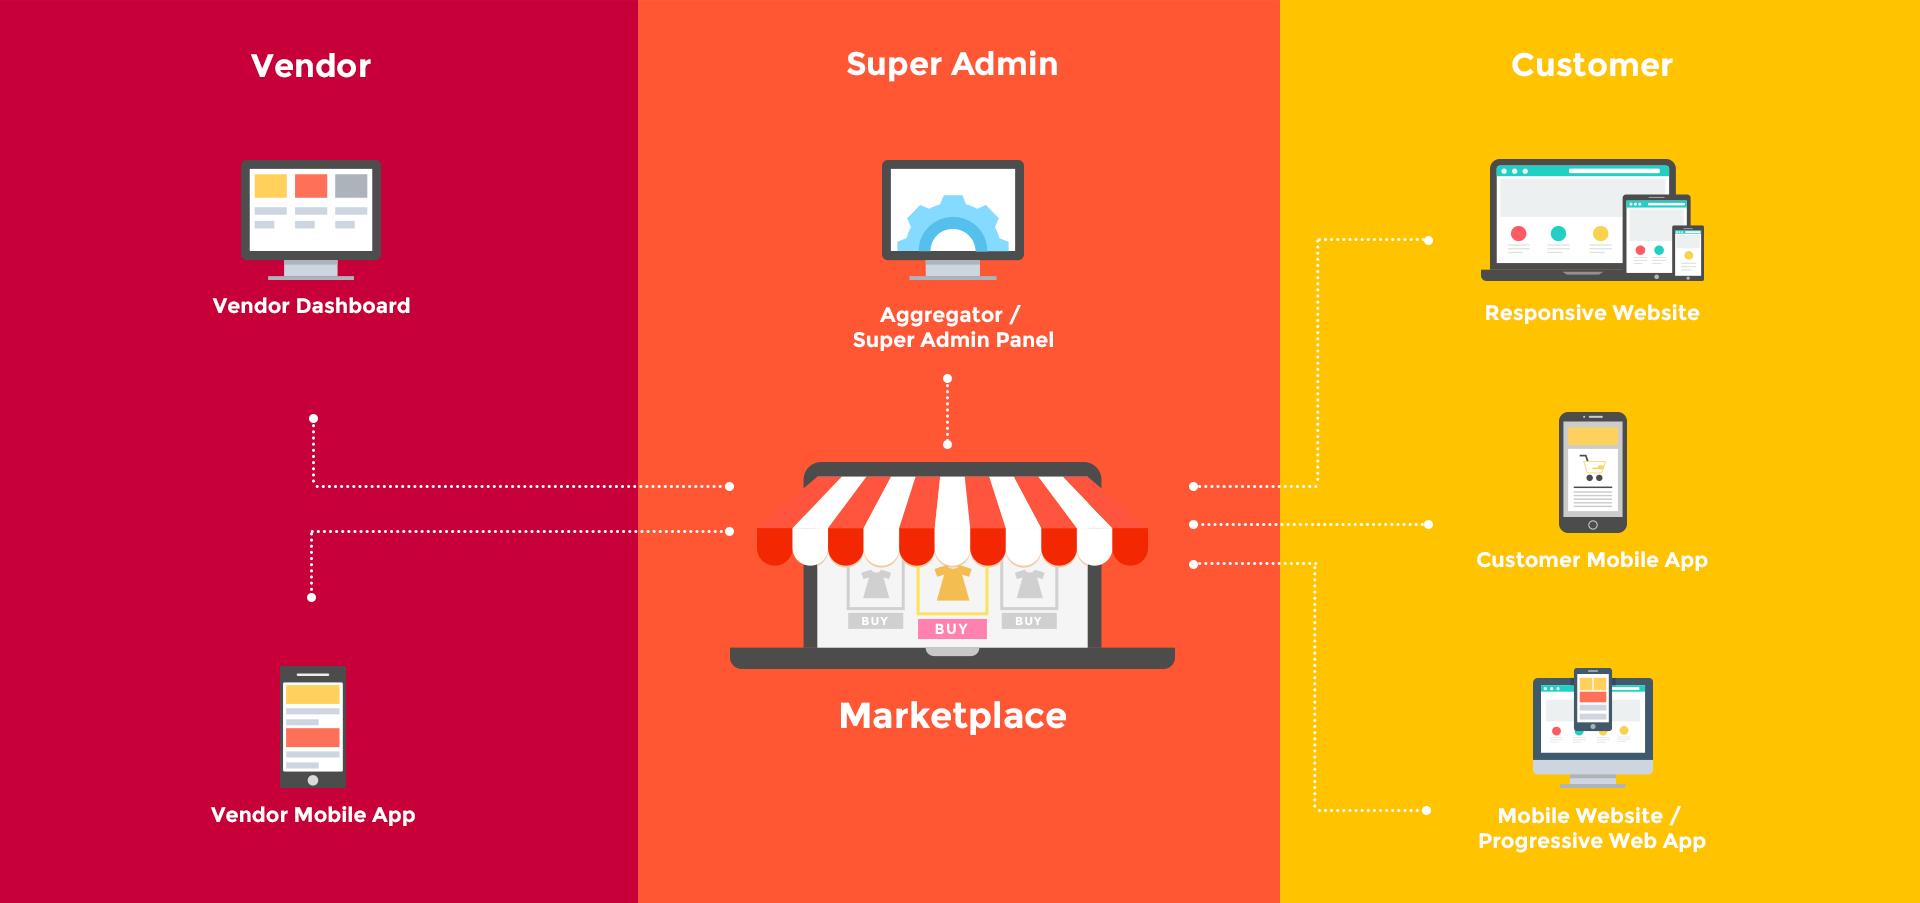 Vendor Super Admin  J 4 I  Vendor Dashboard Aggregator / ROT LI@C LTO FT T]  M     Marketplace  Vendor Mobile App